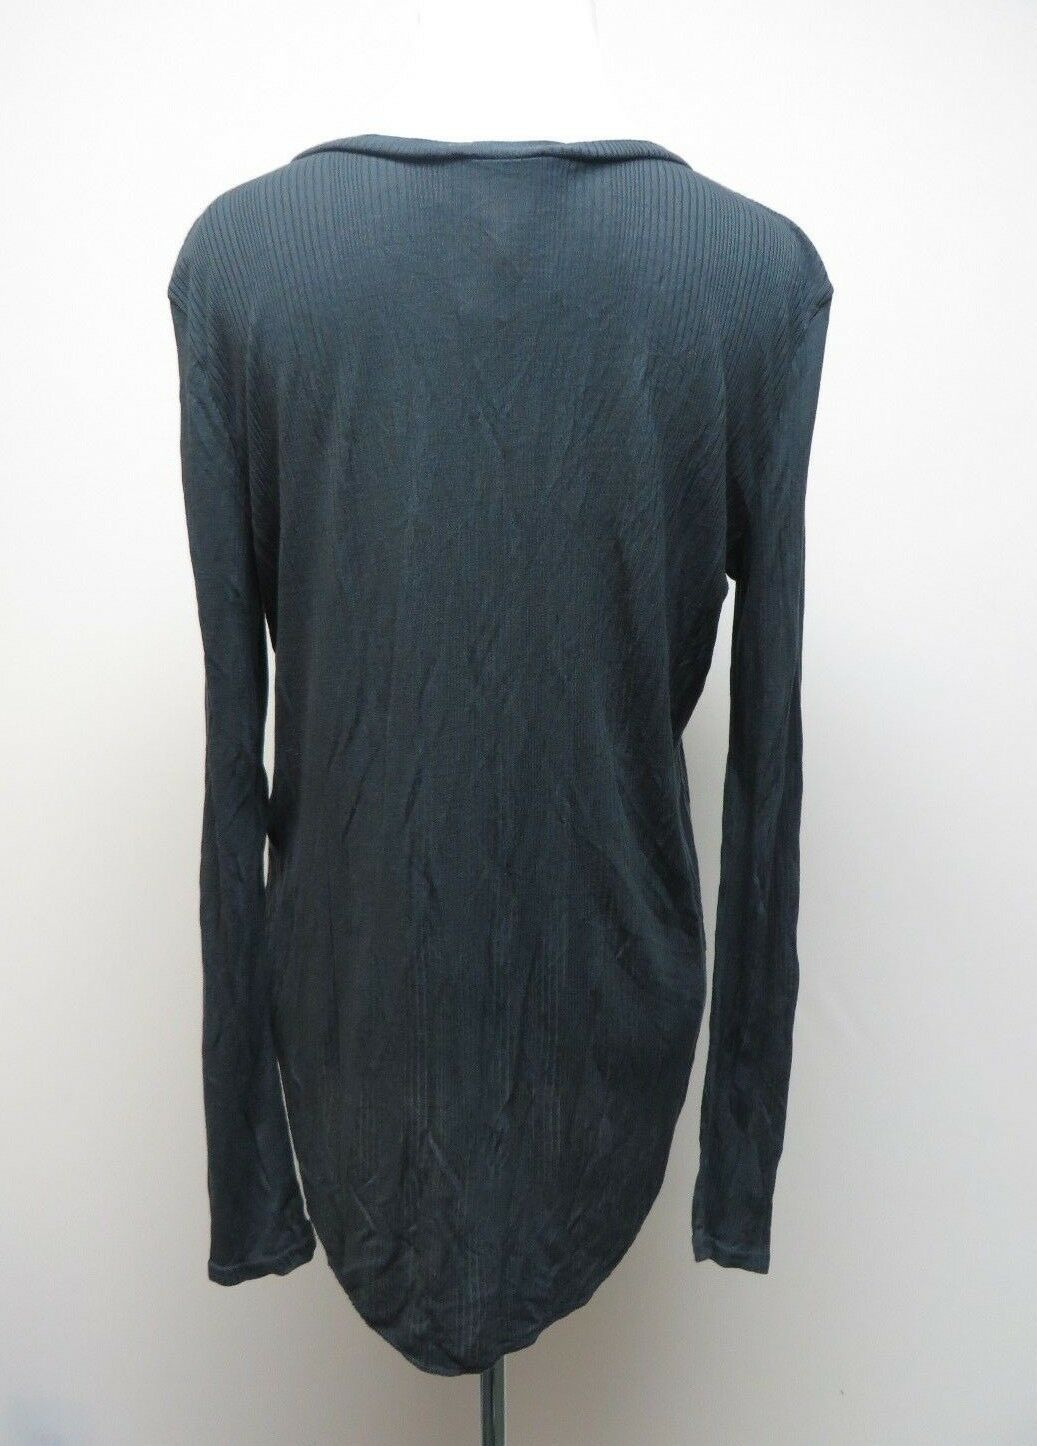 Denim & Supply Ralph Lauren 8994 Womens Henley Ribbed Henley Top Size M # H 741